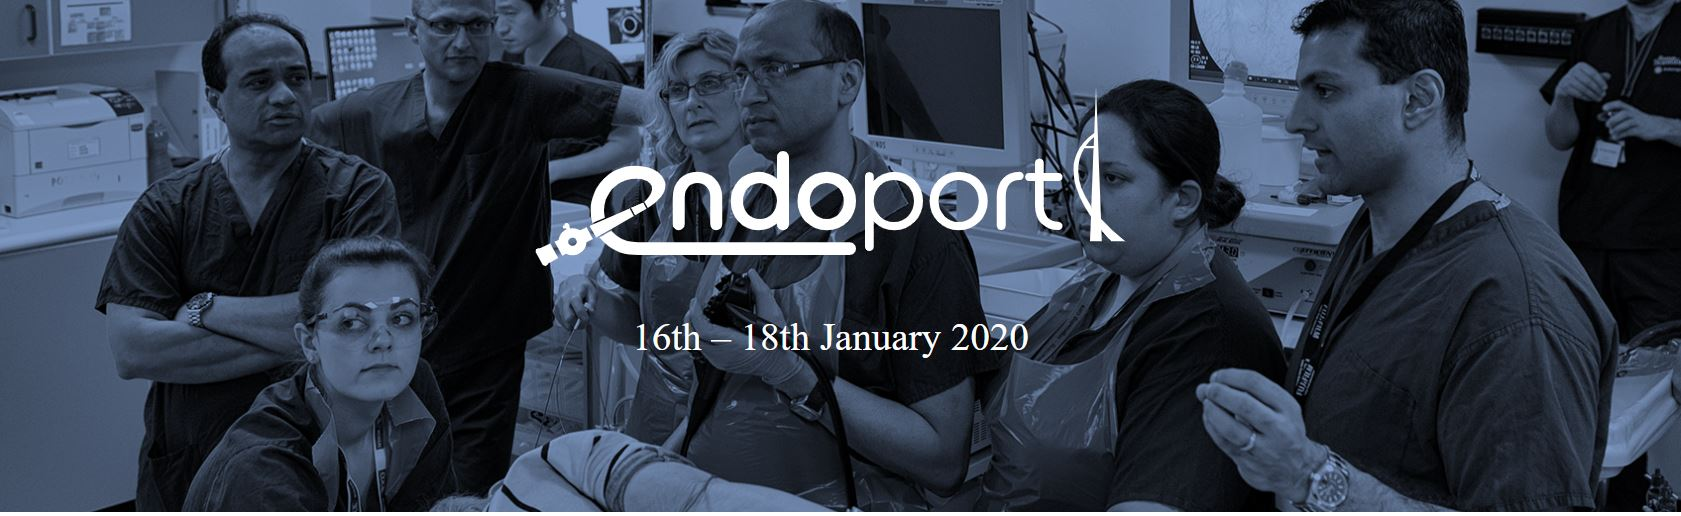 Portsmouth Advanced Endoscopy symposium